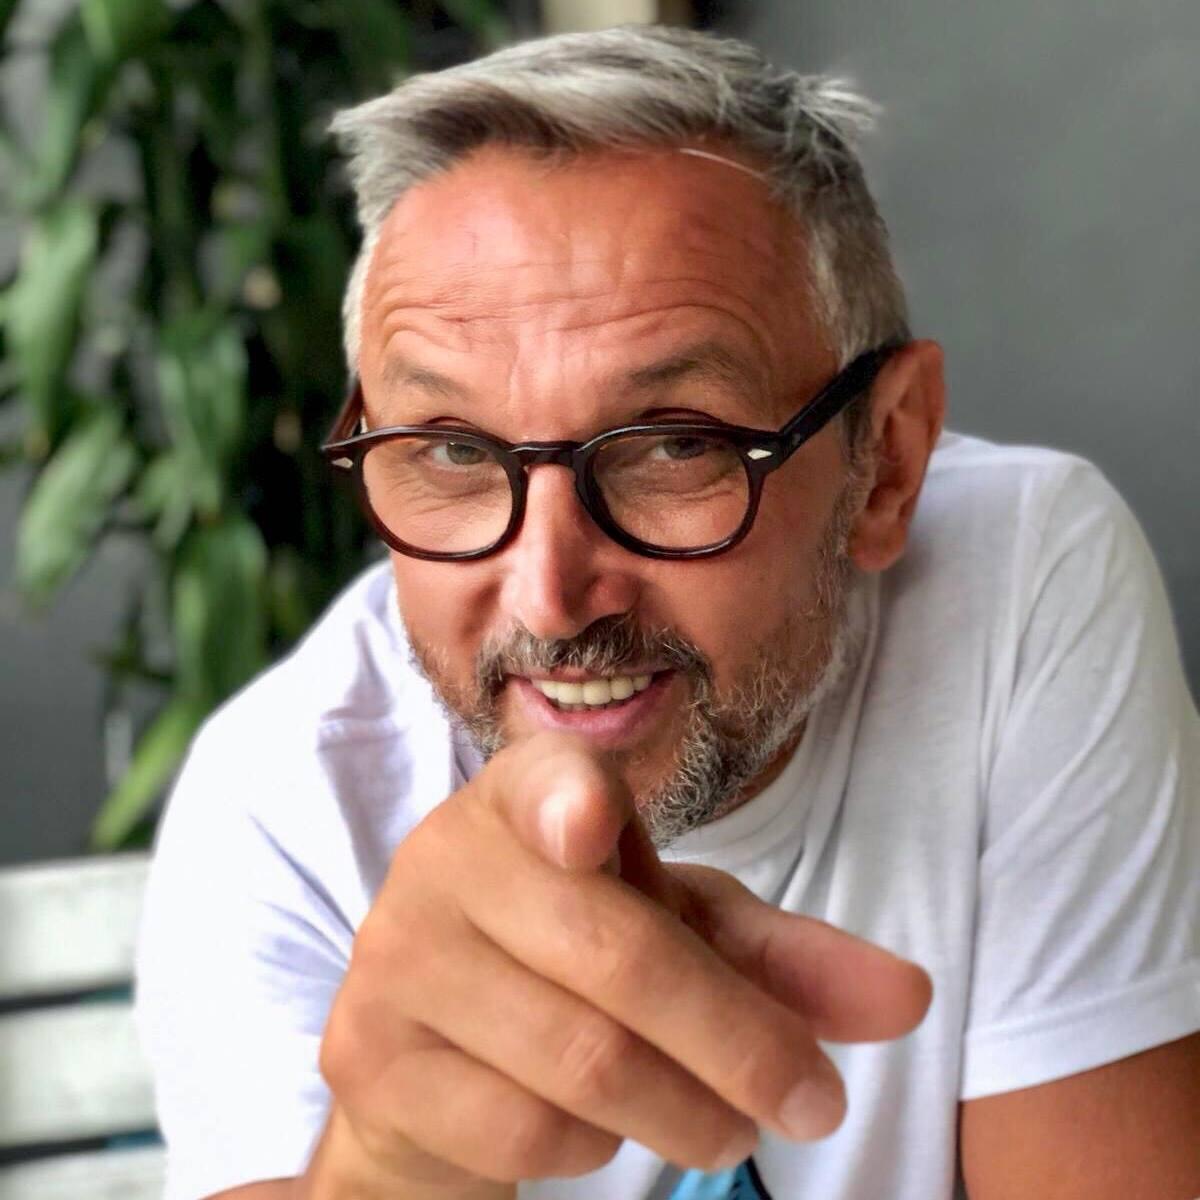 BrunoBarbieri